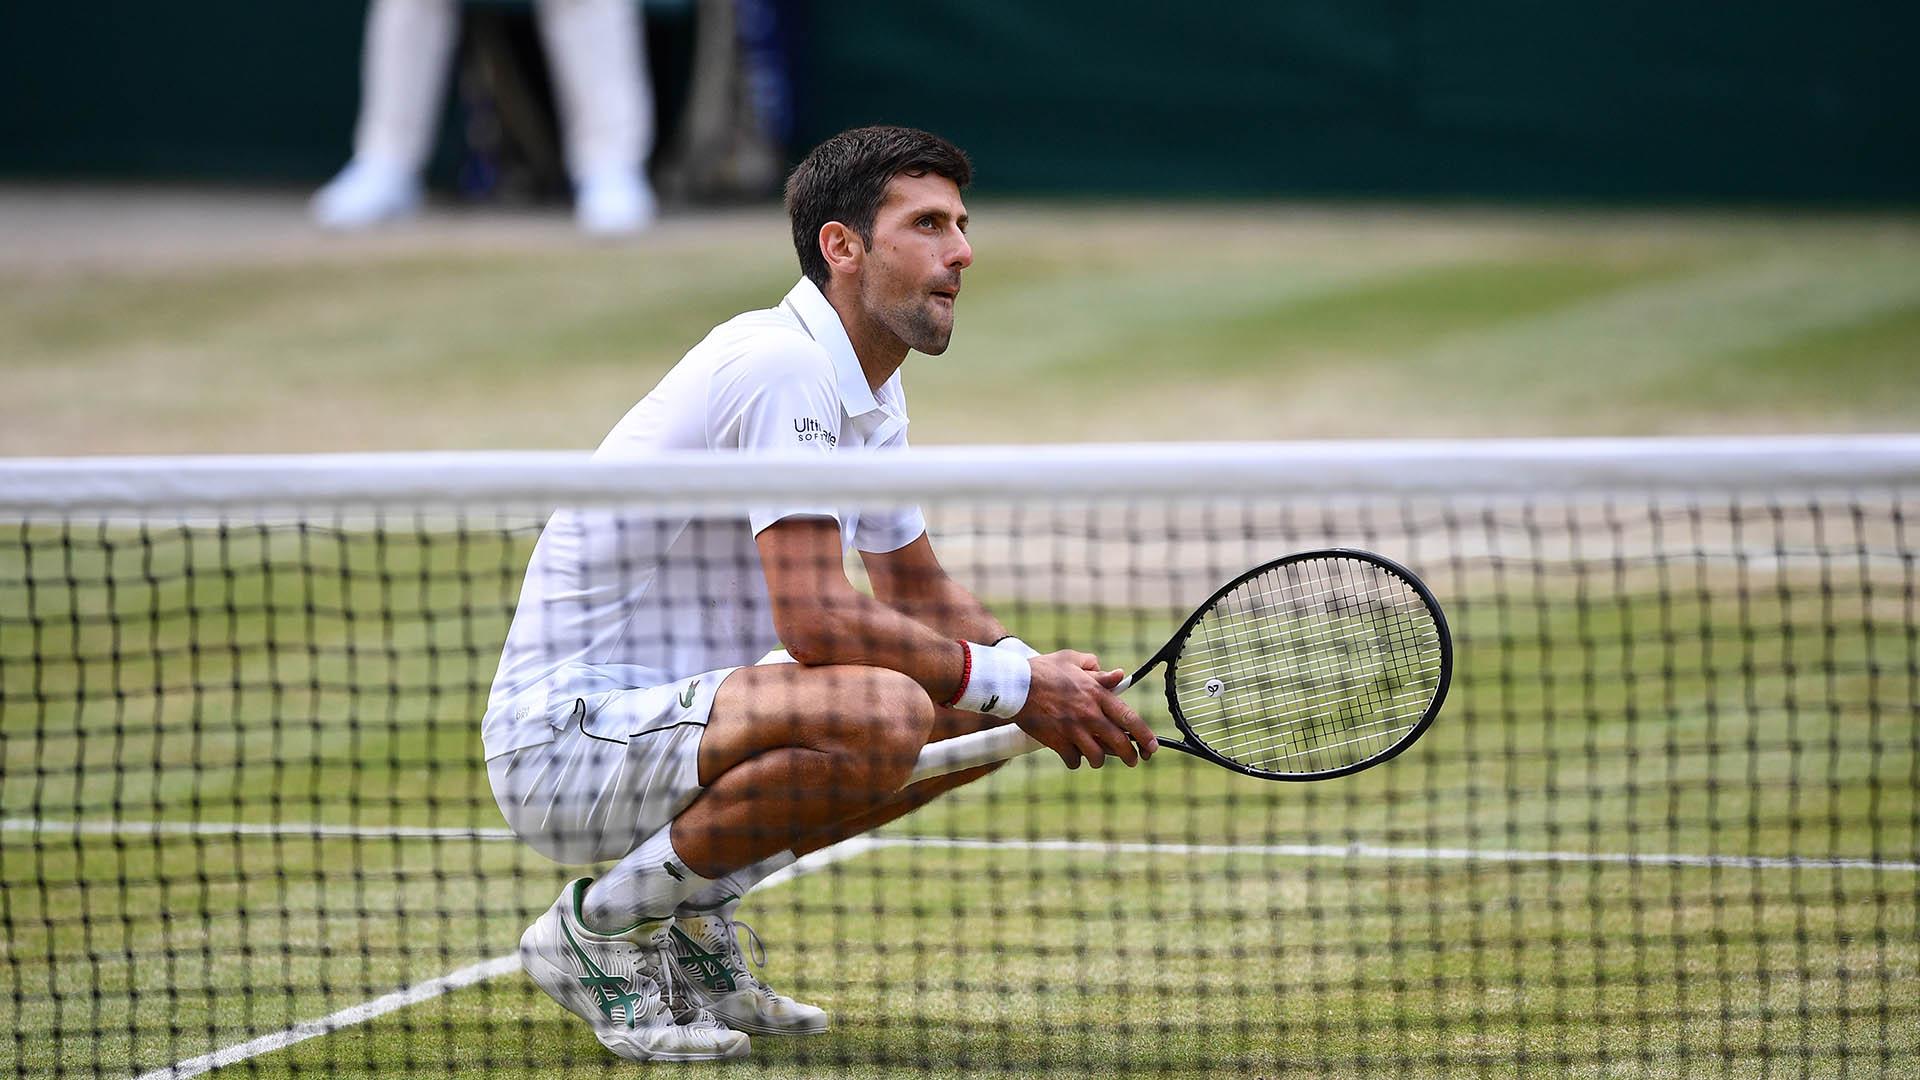 Nopvak Djokovic se consagró campeón de la edición 2019 de Wimbledon (AFP)